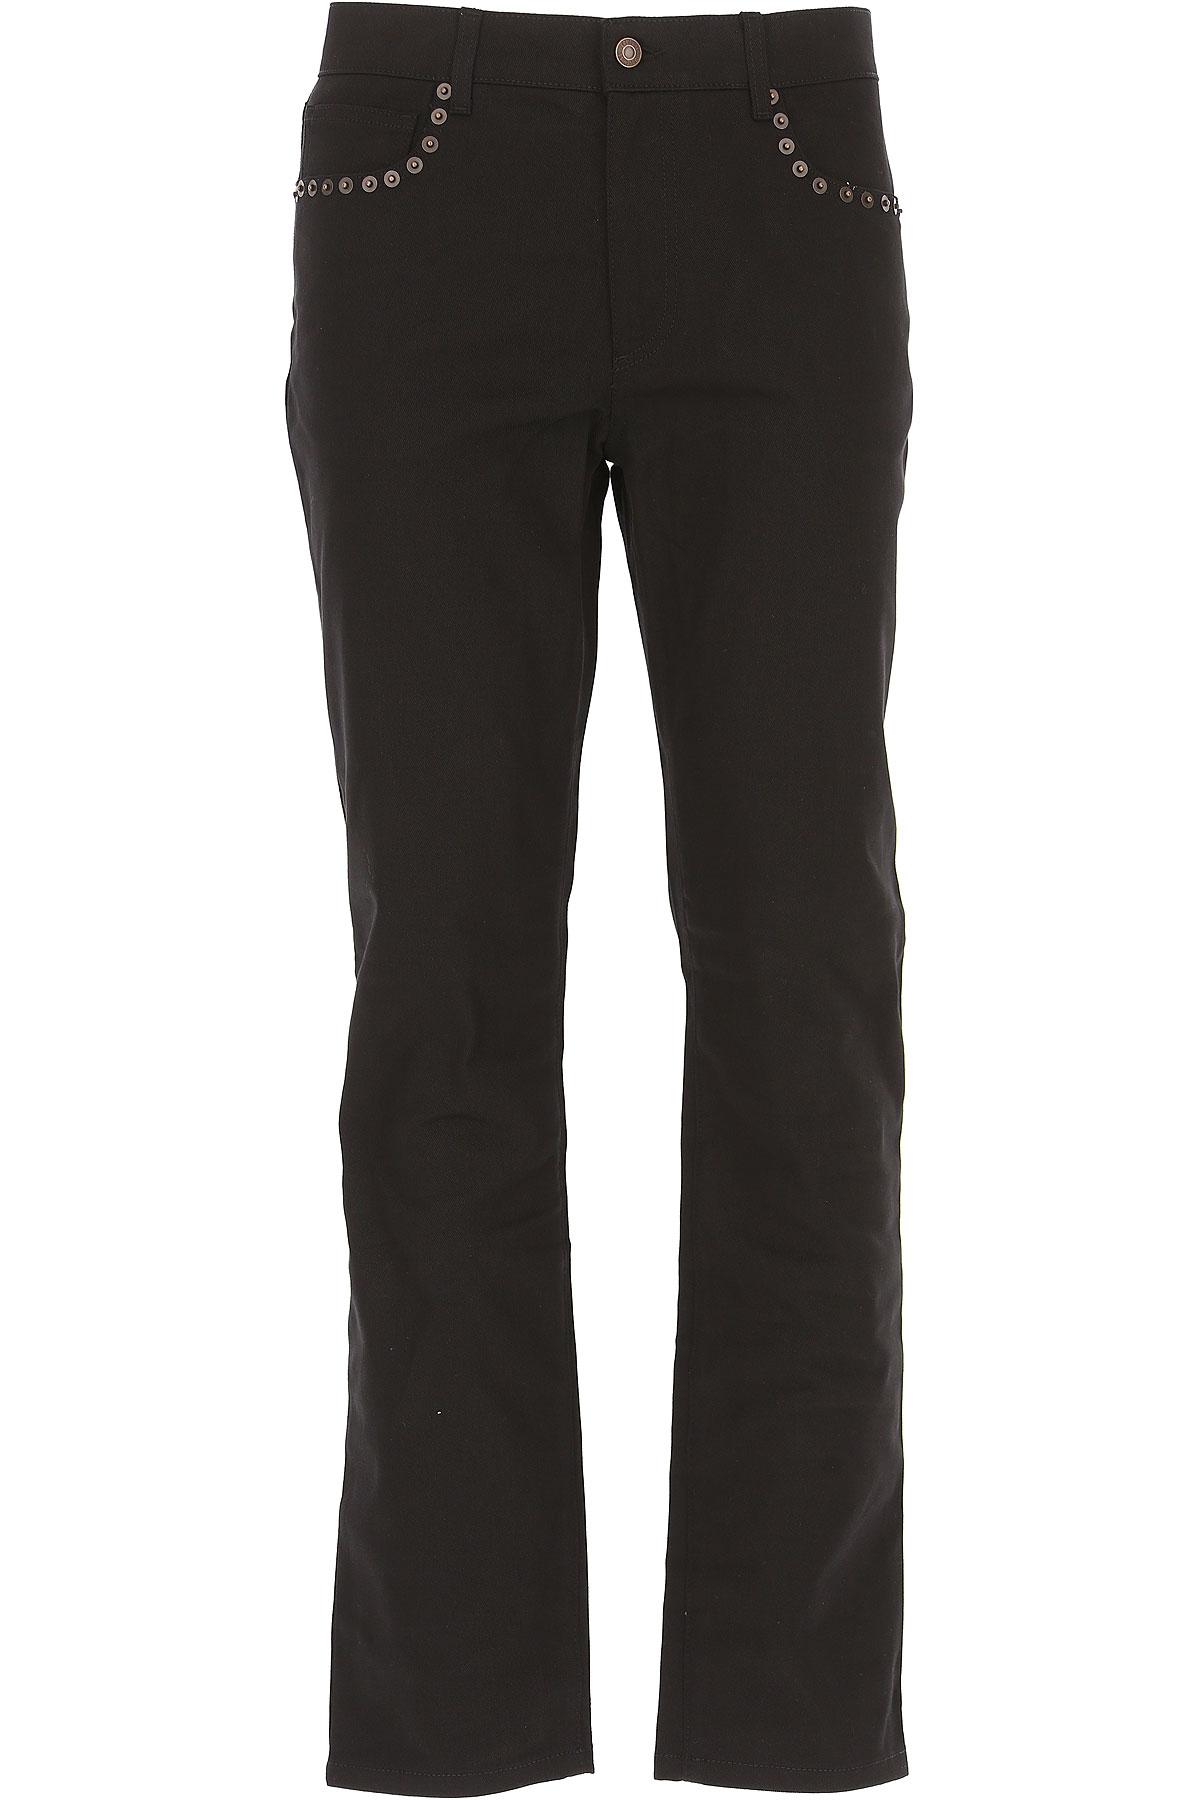 Moschino Jeans On Sale, Black, Cotton, 2017, 30 32 36 USA-447978